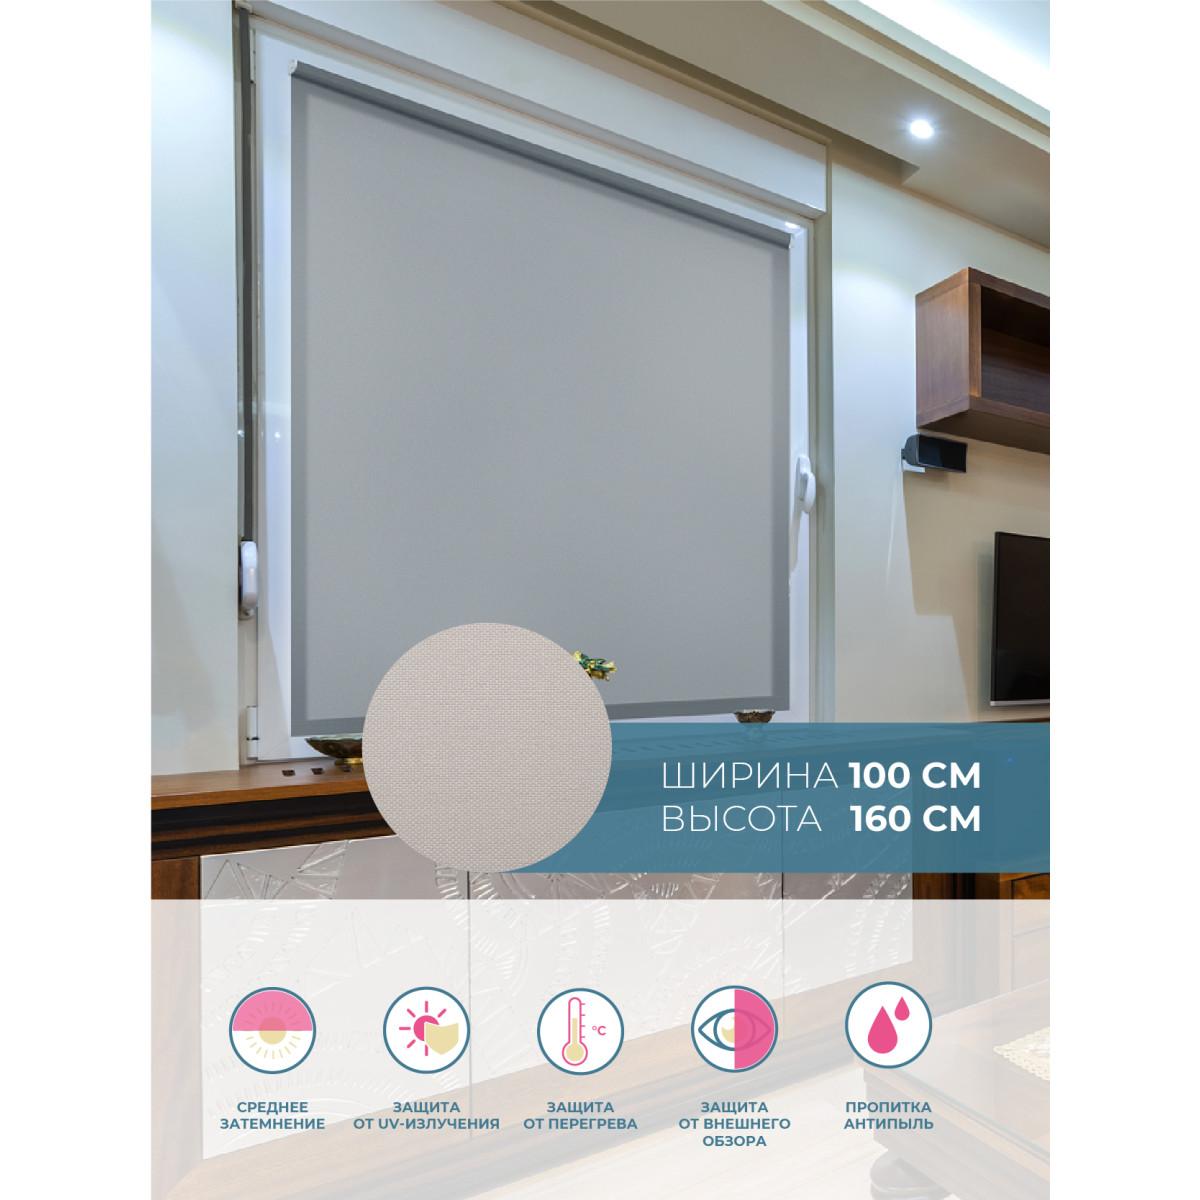 Рулонная Ора Decofest Плайн 100Х160 Цвет Серый